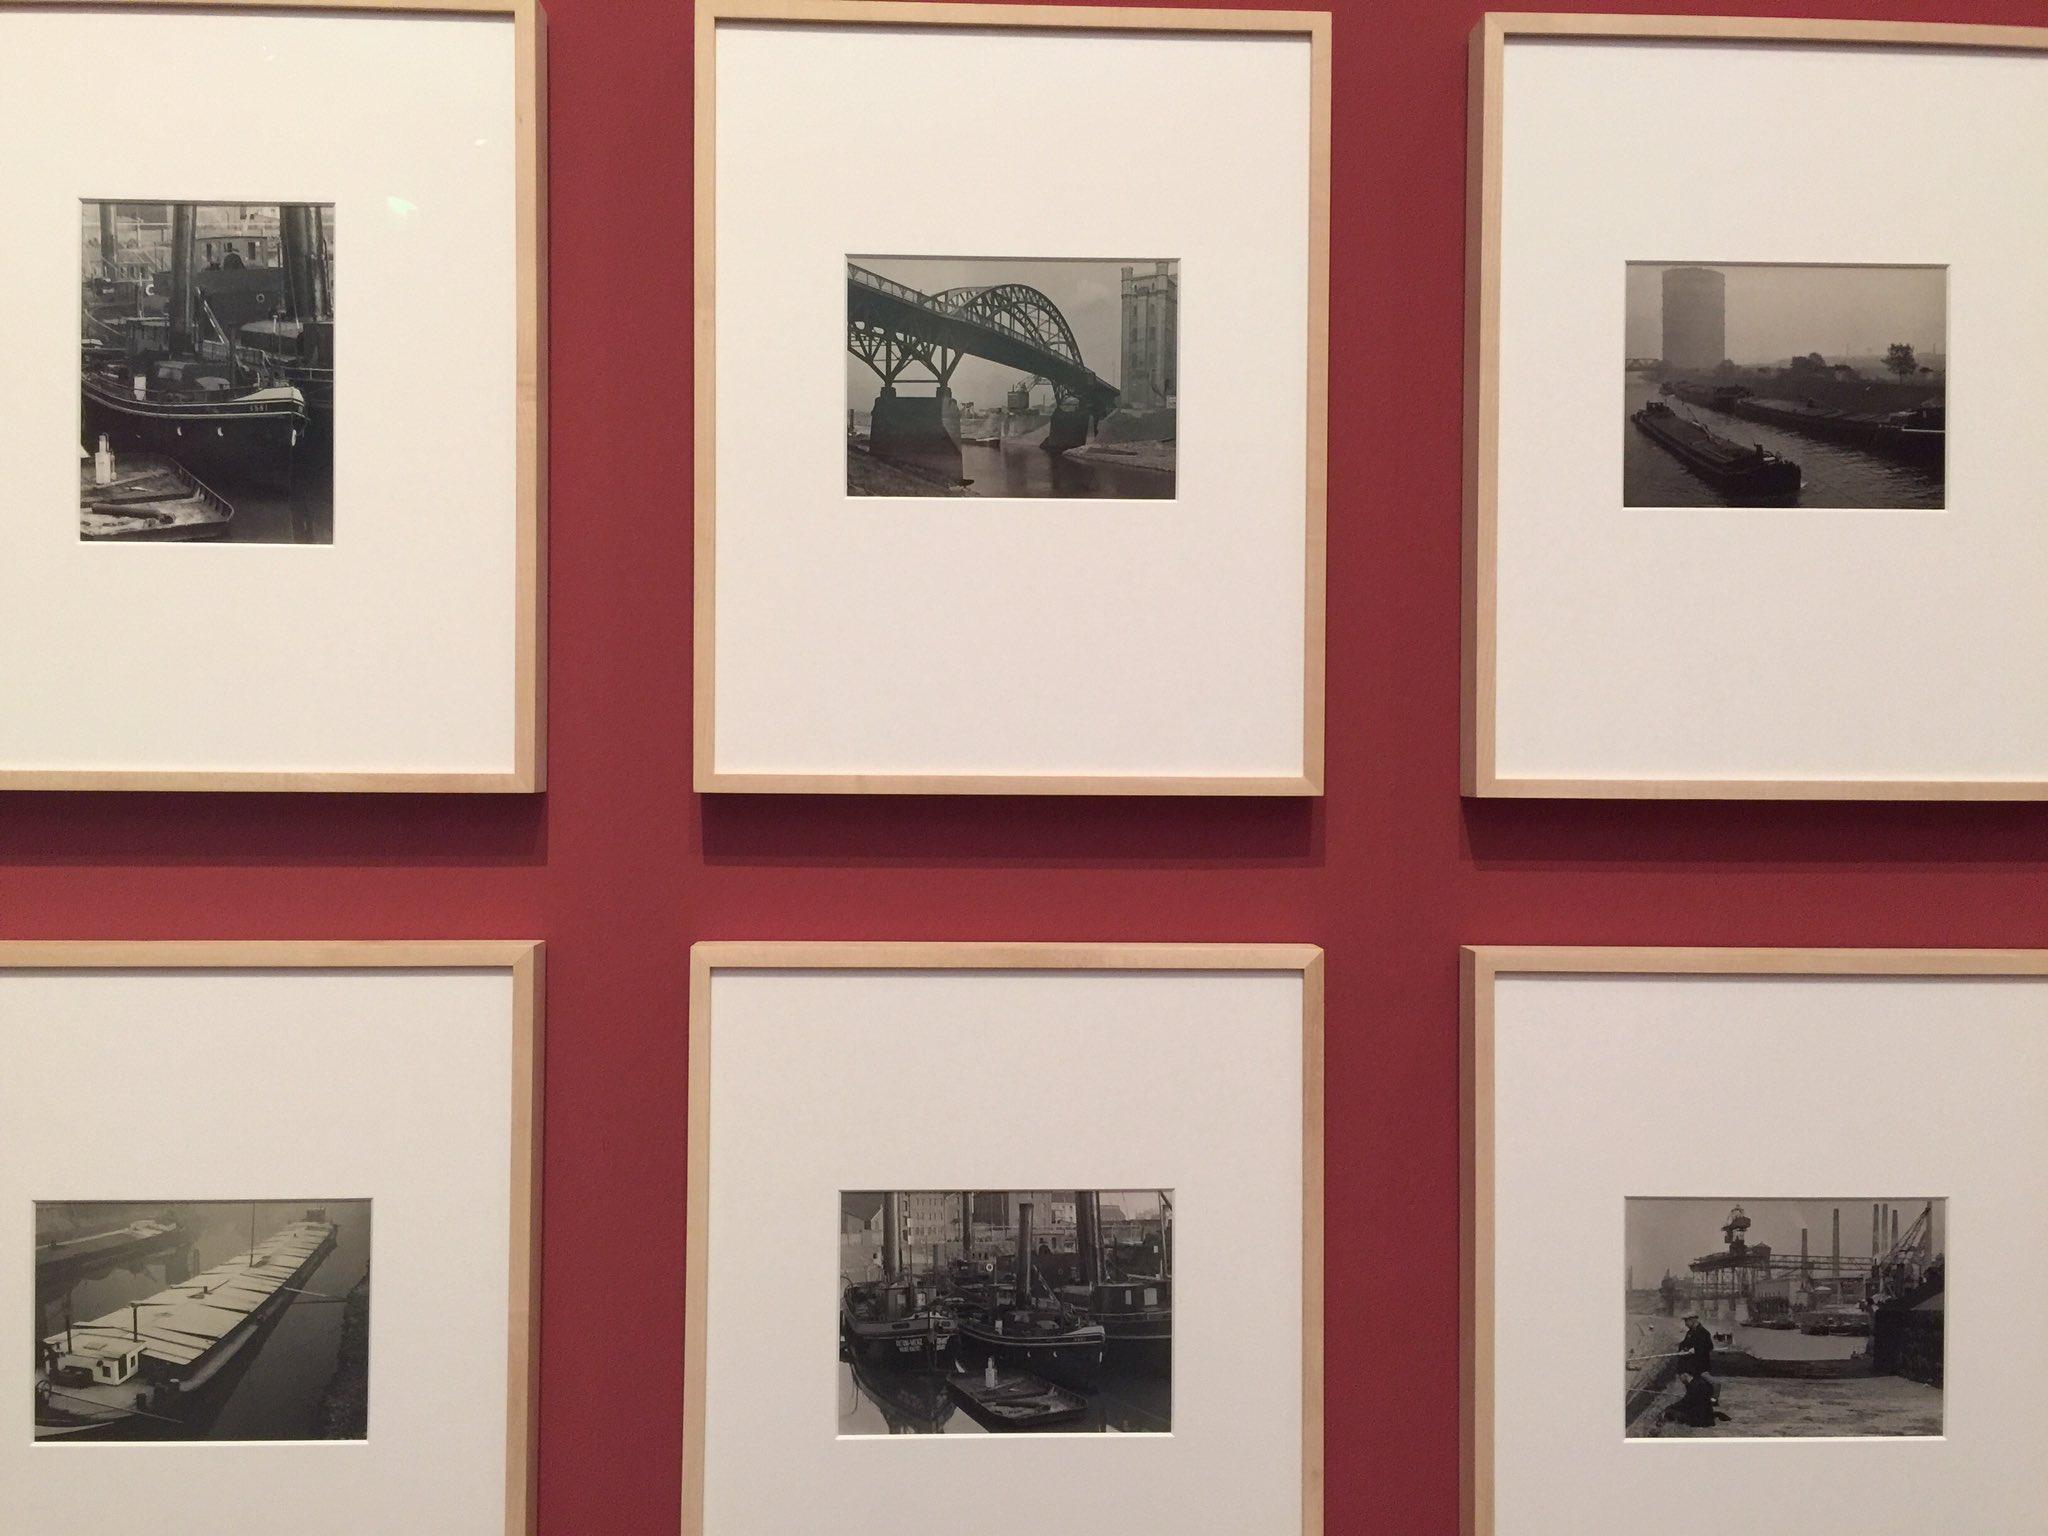 Nuancen von Grau, Gerüste, Brücken, das ist #stadtlandbild #rengerpatzsch - @Pinakotheken Inspiration für #stadtlandmuc @kulturkonsorten https://t.co/WvU6yqMO7L